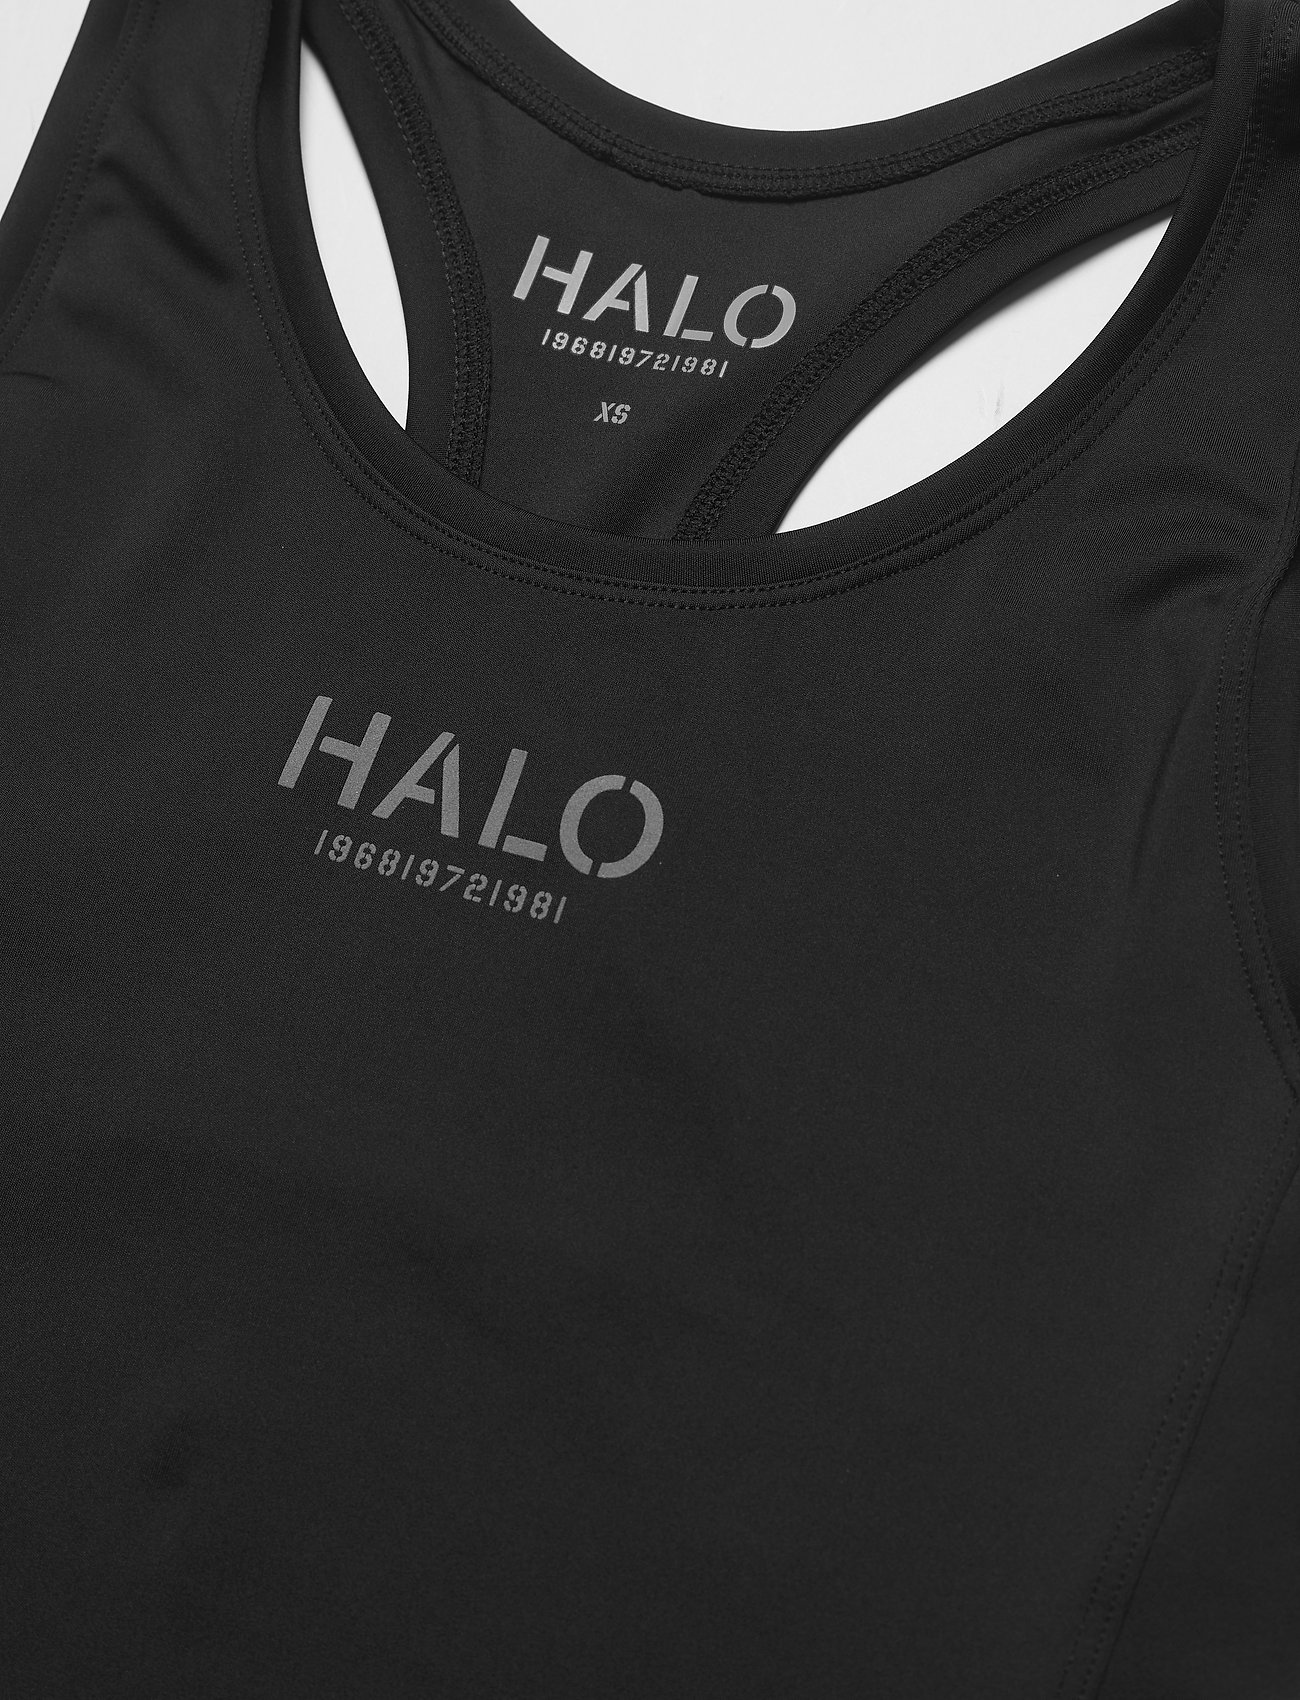 HALO - HALO WOMENS RACERBACK TANK - toppar & t-shirts - black - 2